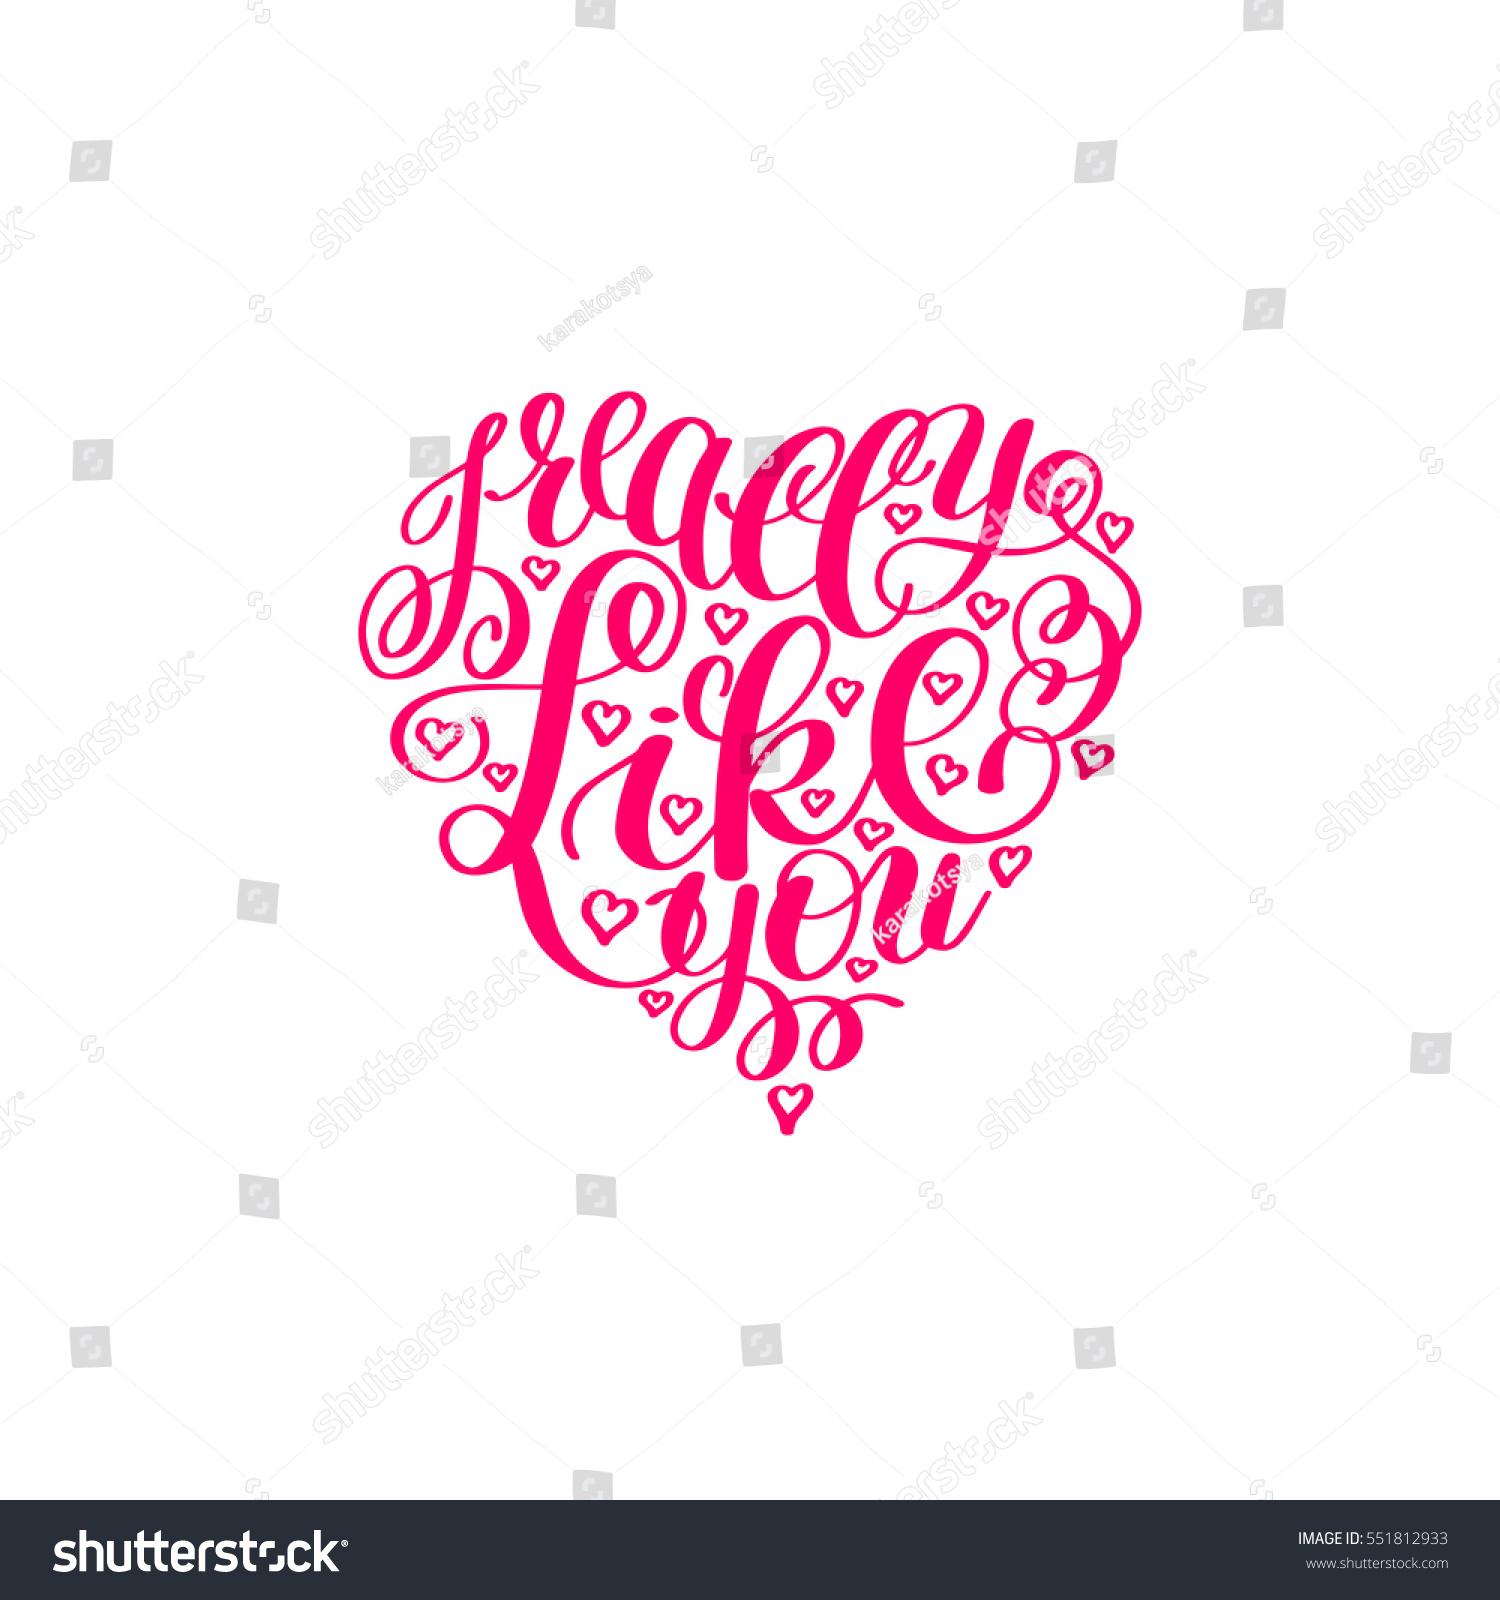 Really Like You Love Letter On Stock Illustration 551812933